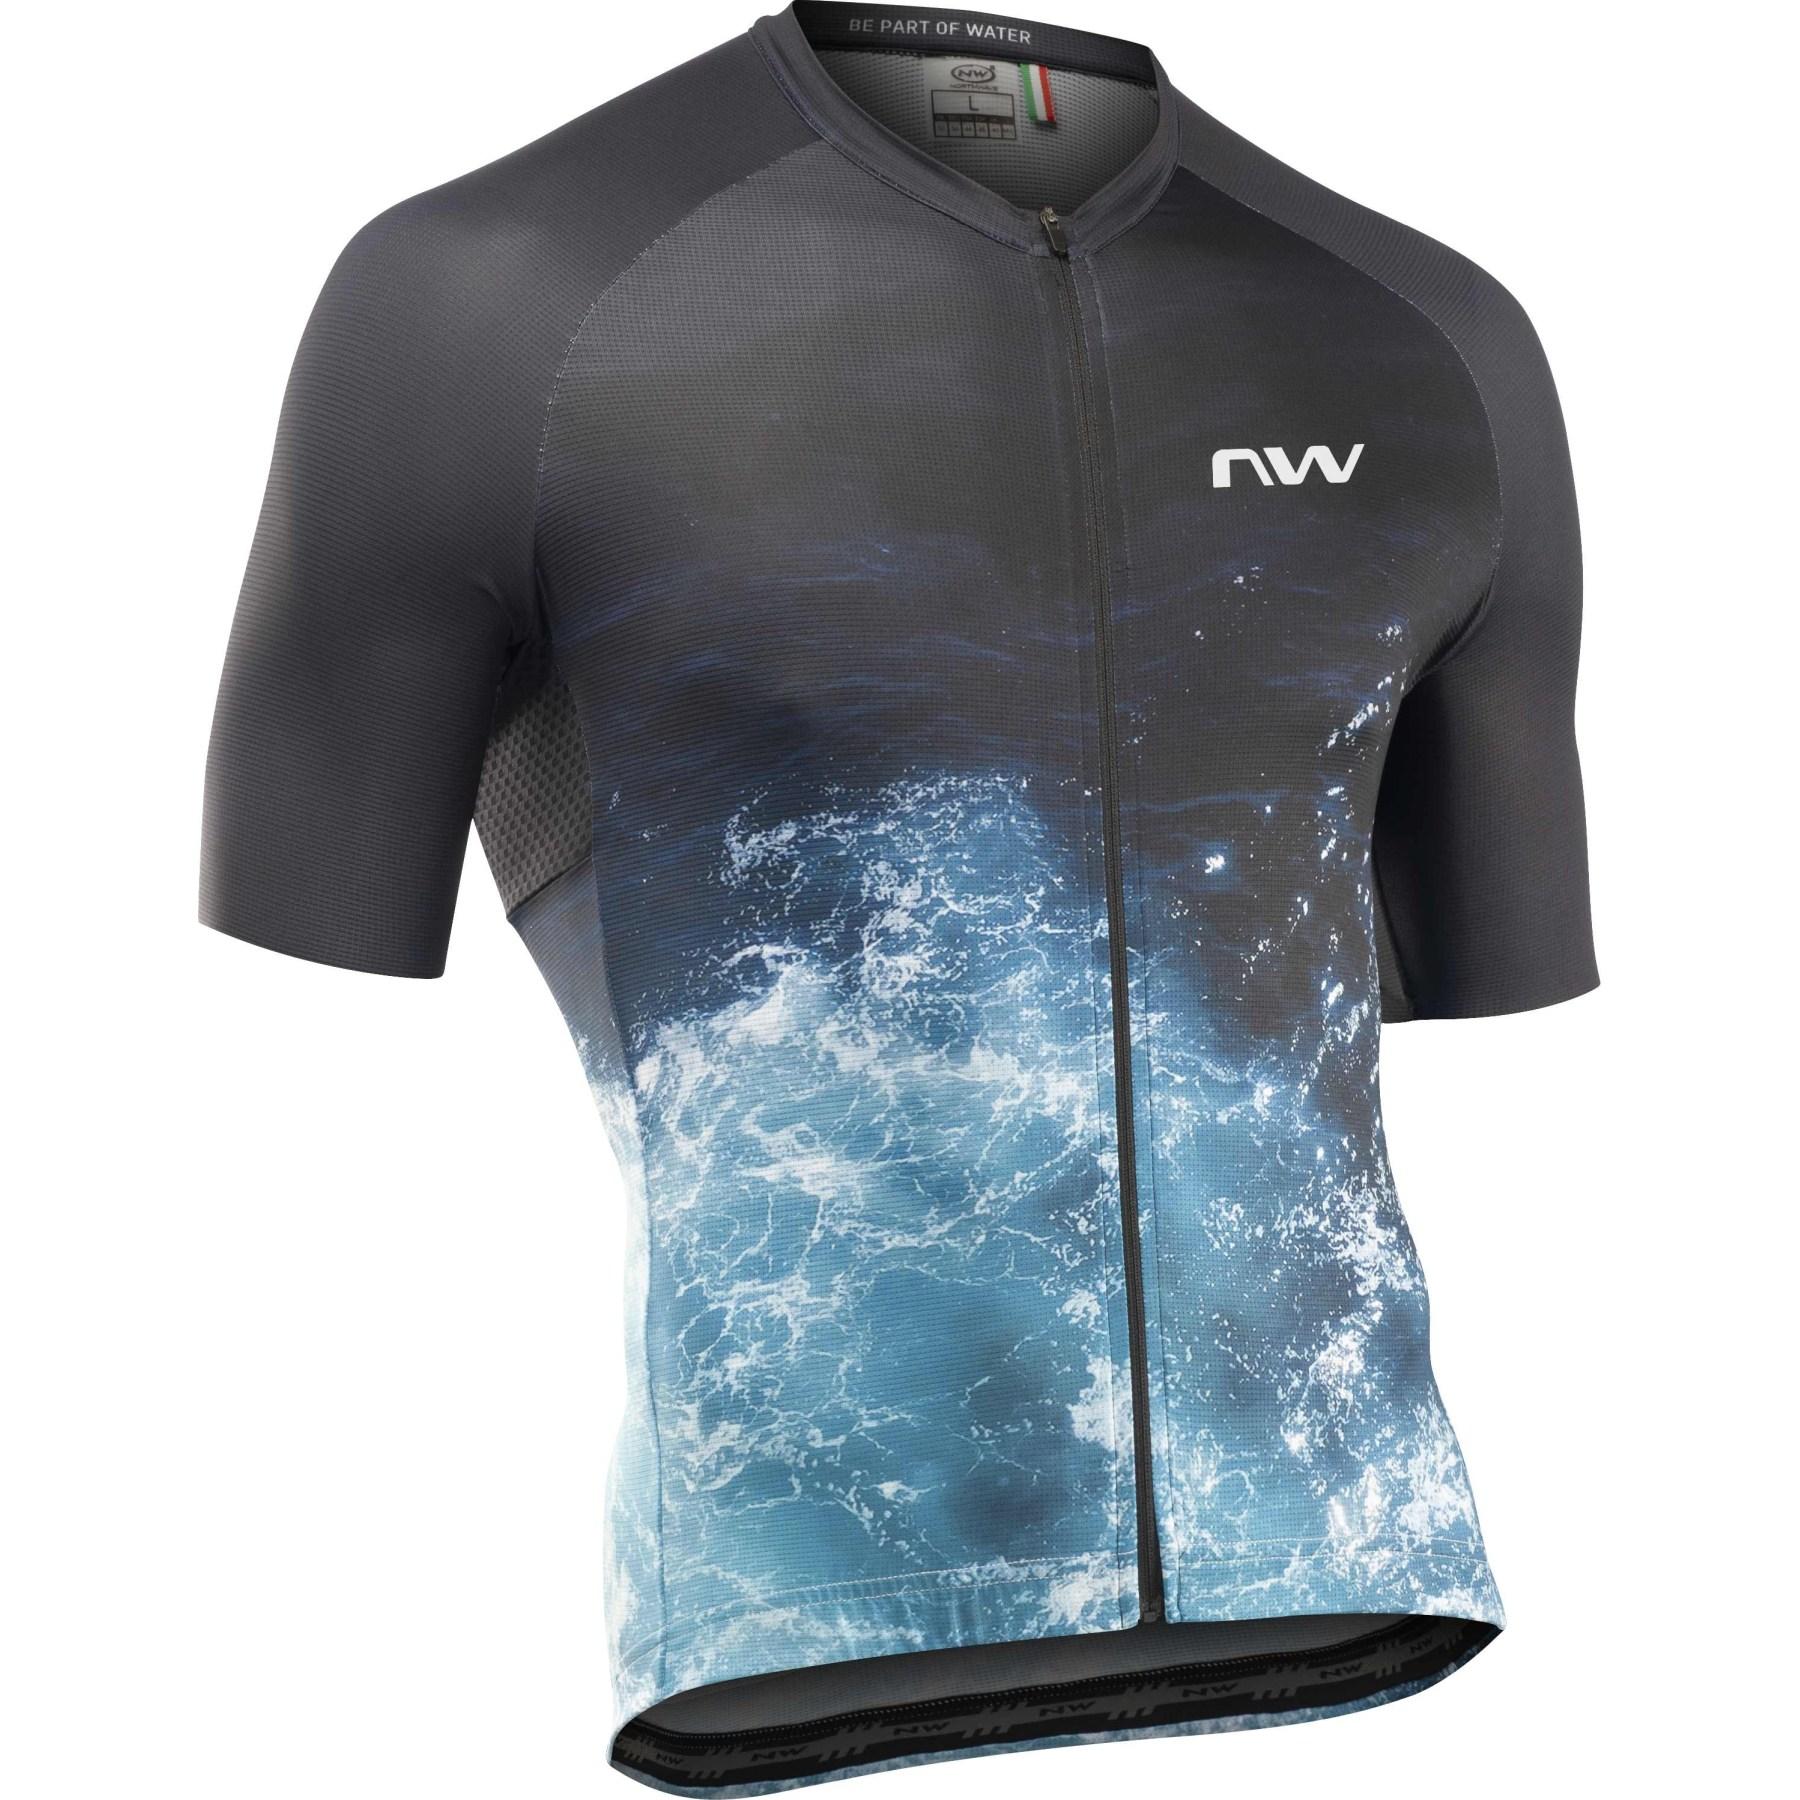 Northwave Water Jersey Short Sleeve - black/blue